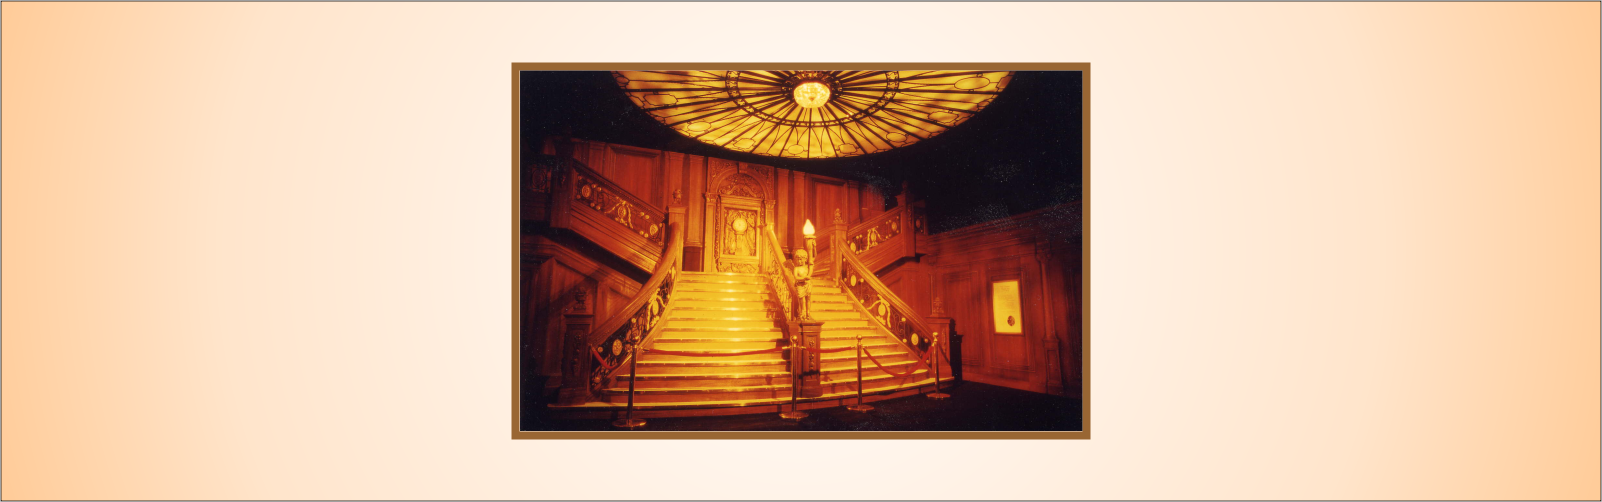 Staircase-Slideshow-1